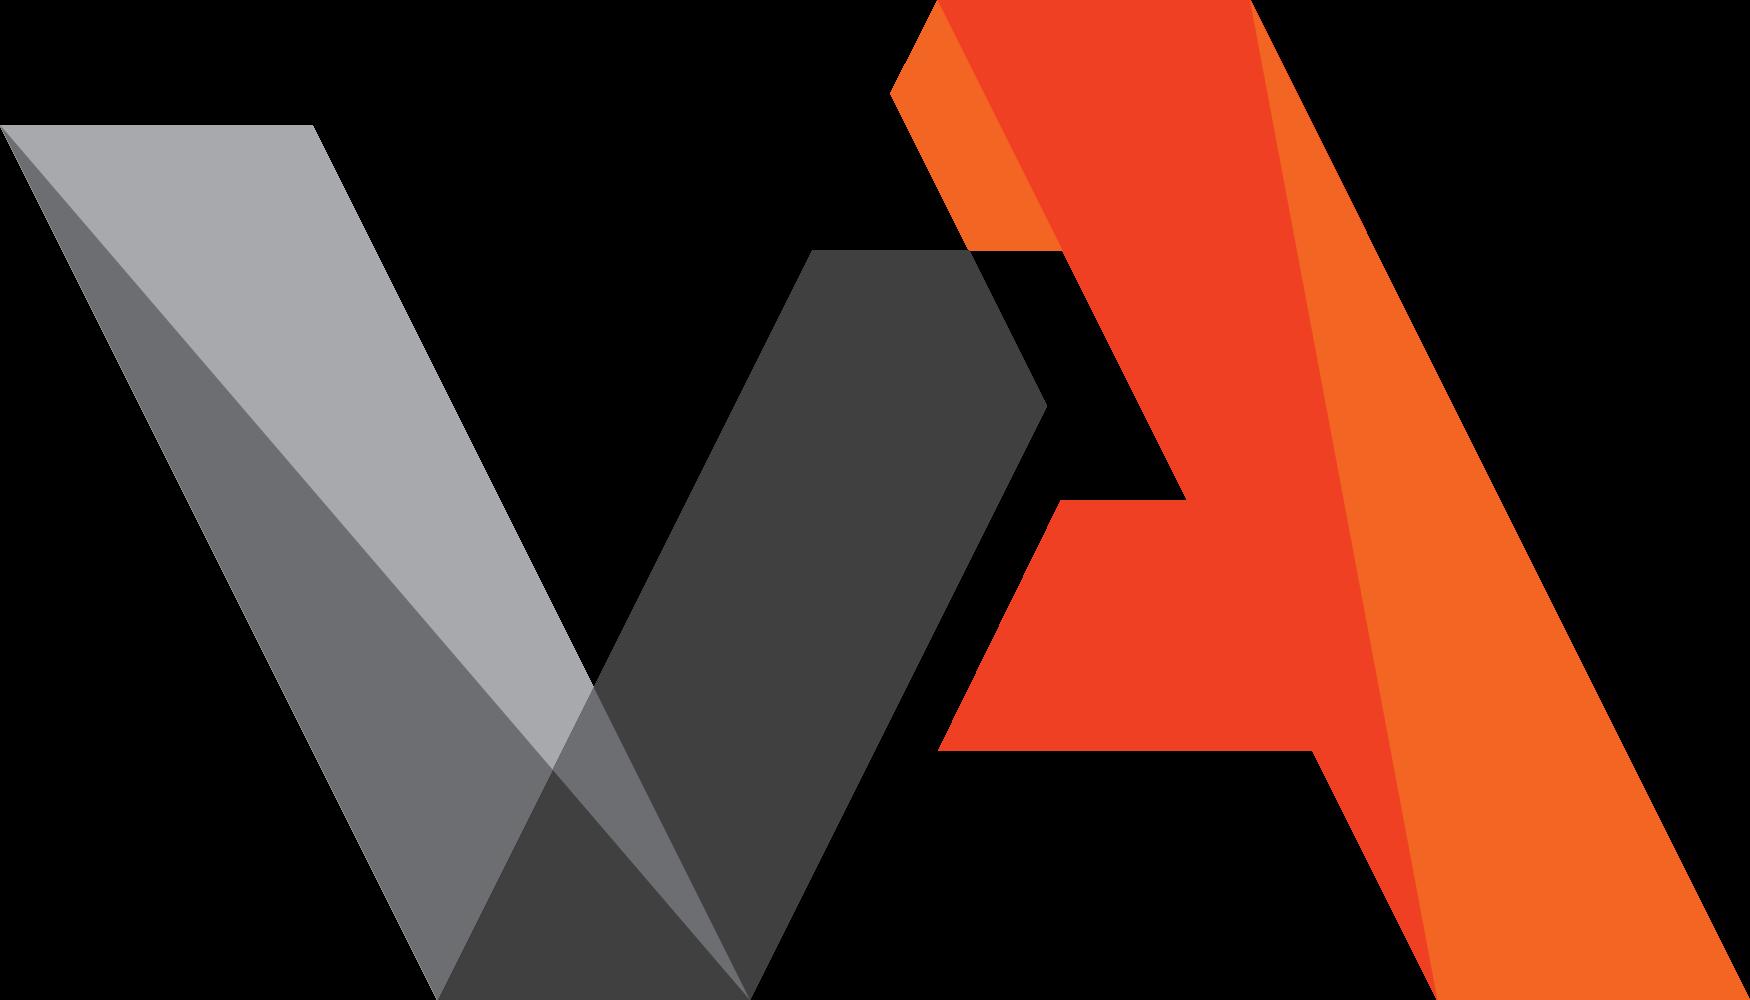 ViaCuatro - Assessoria Corporativa